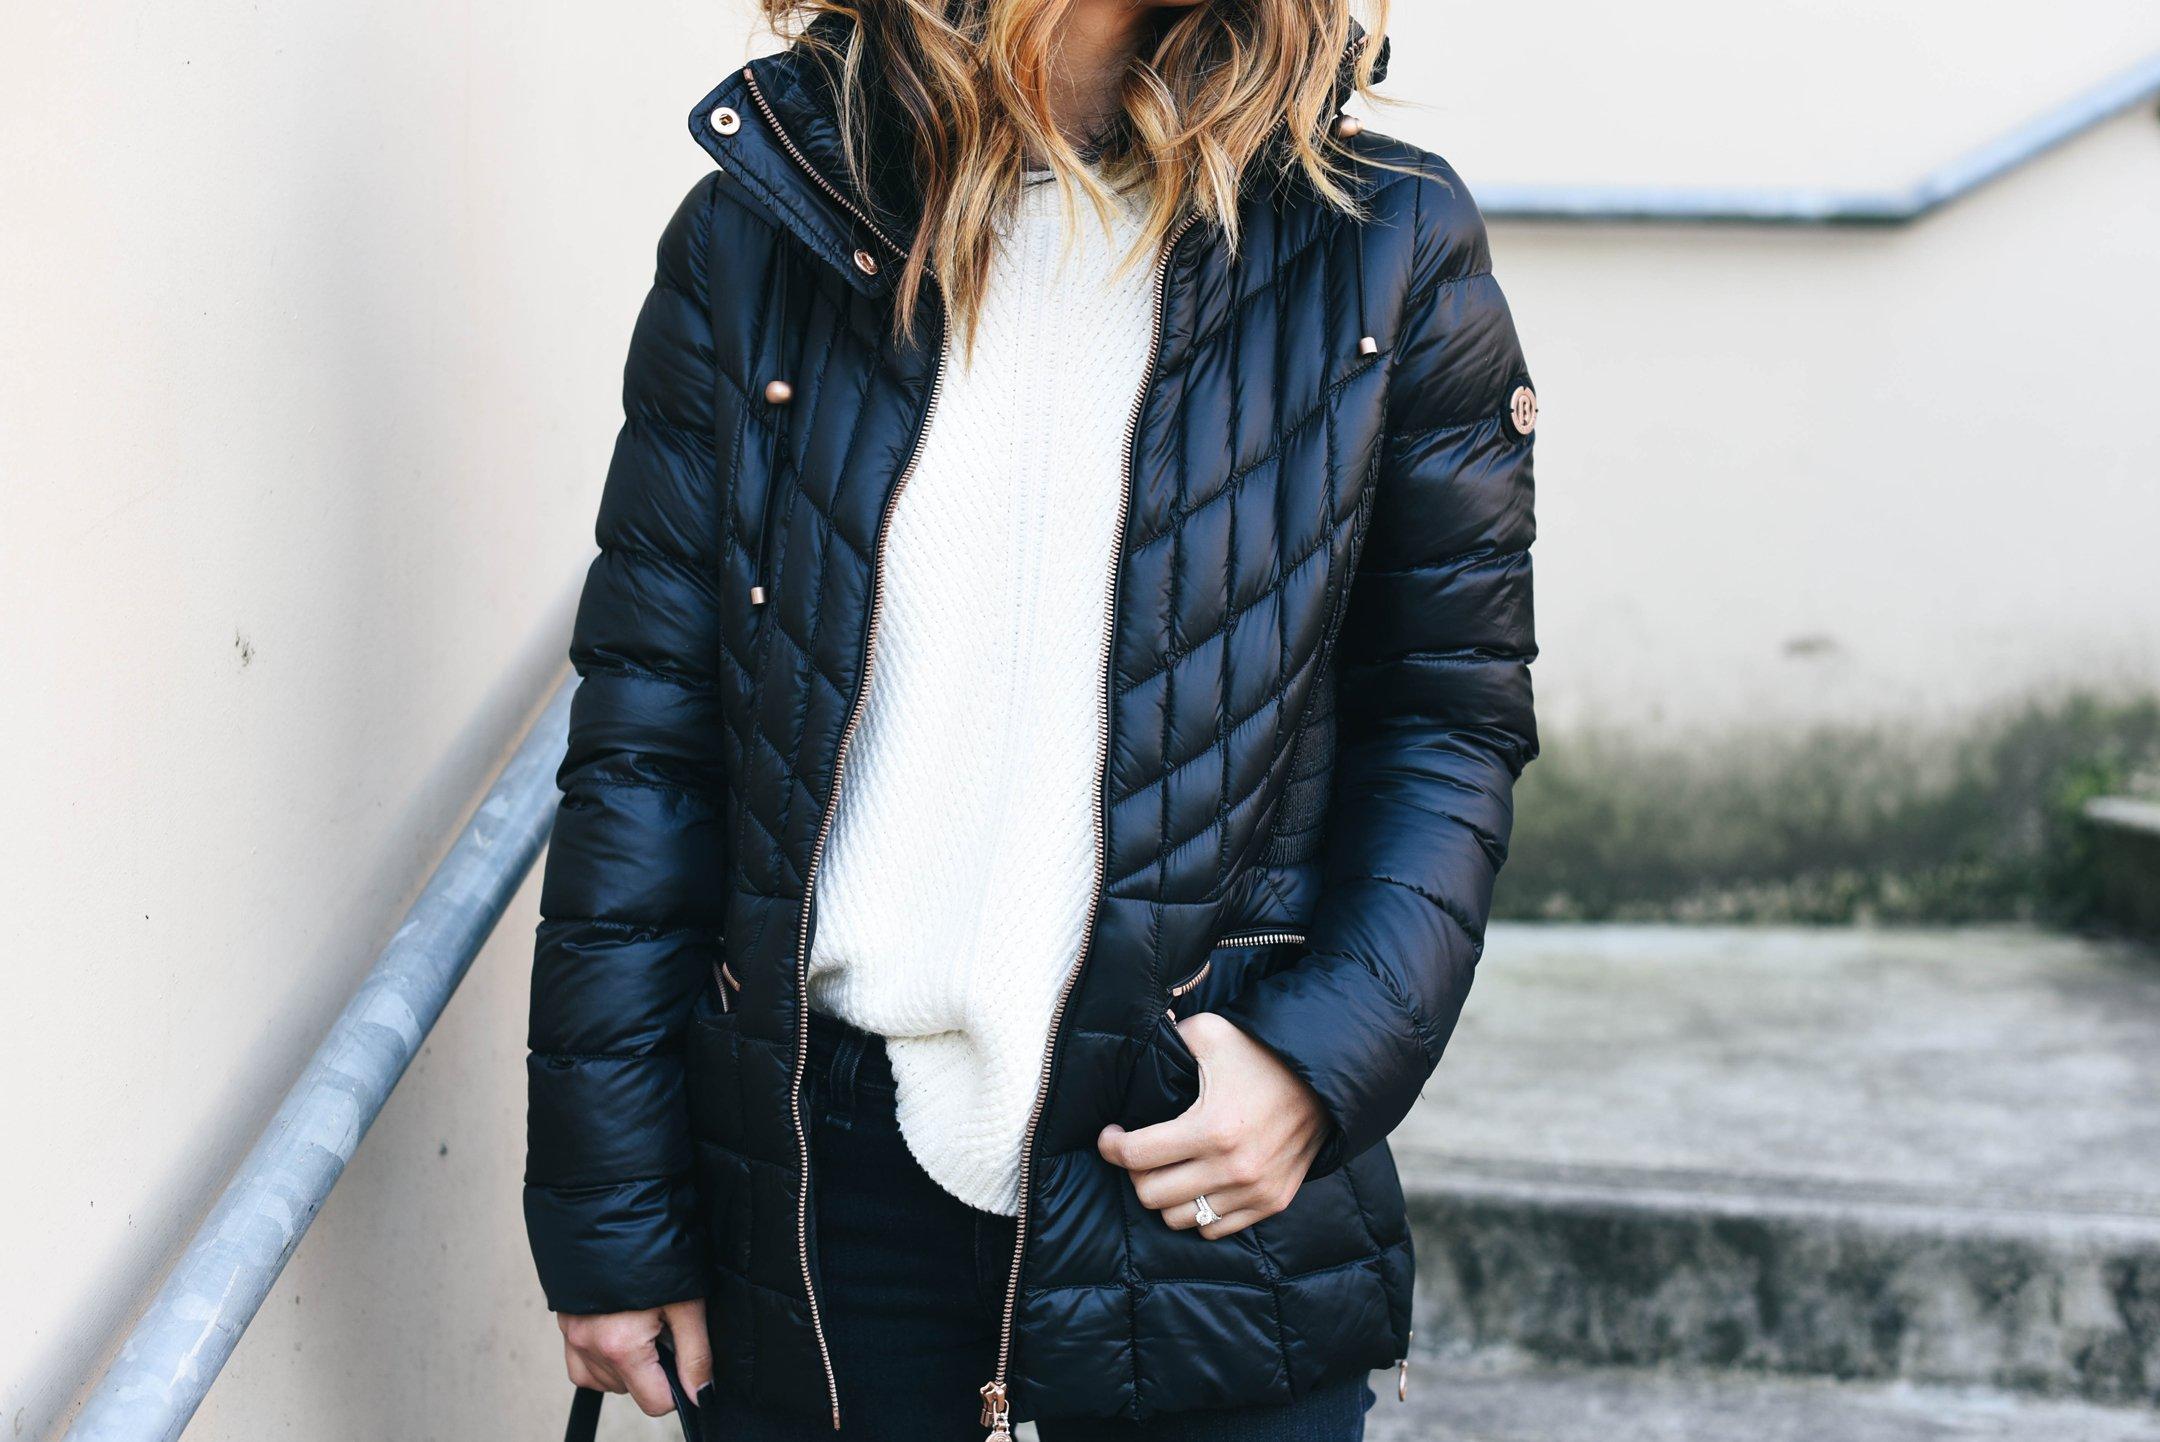 crystalin-marie-wearing-bernardo-black-packable-jacket-with-down-primaloft-fill